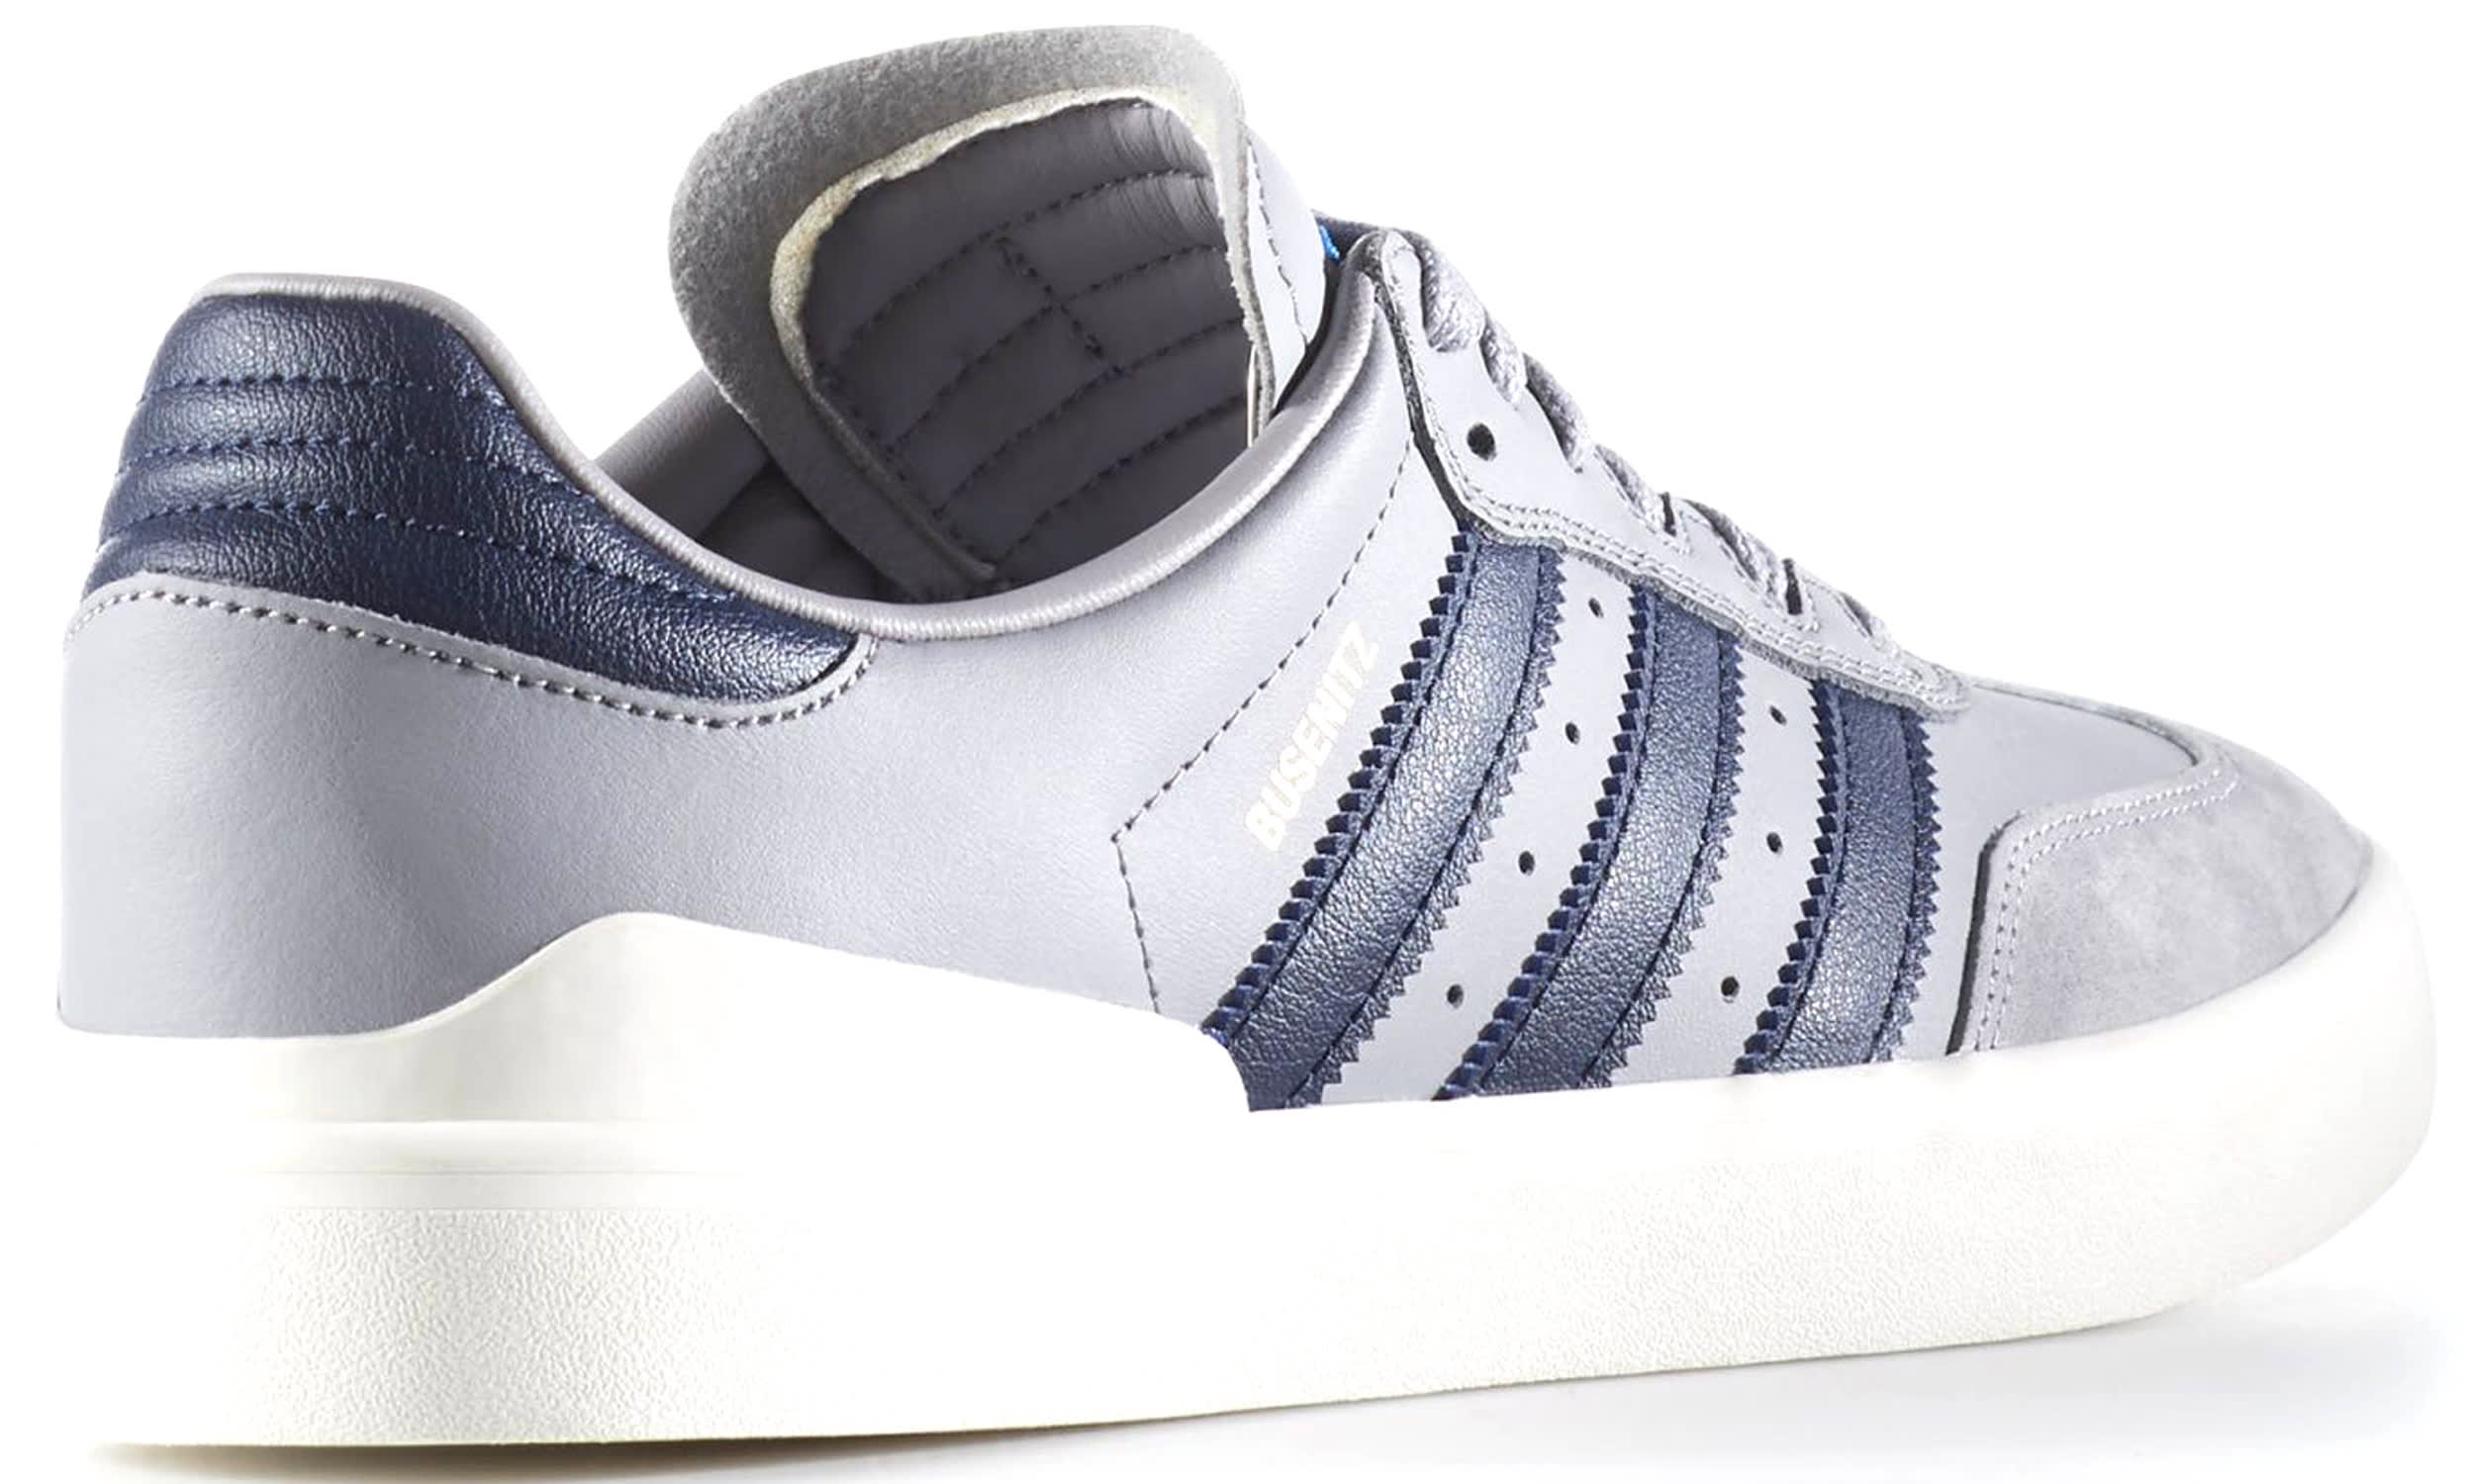 Adidas Busenitz Vulc Samba Edition Skate Shoes